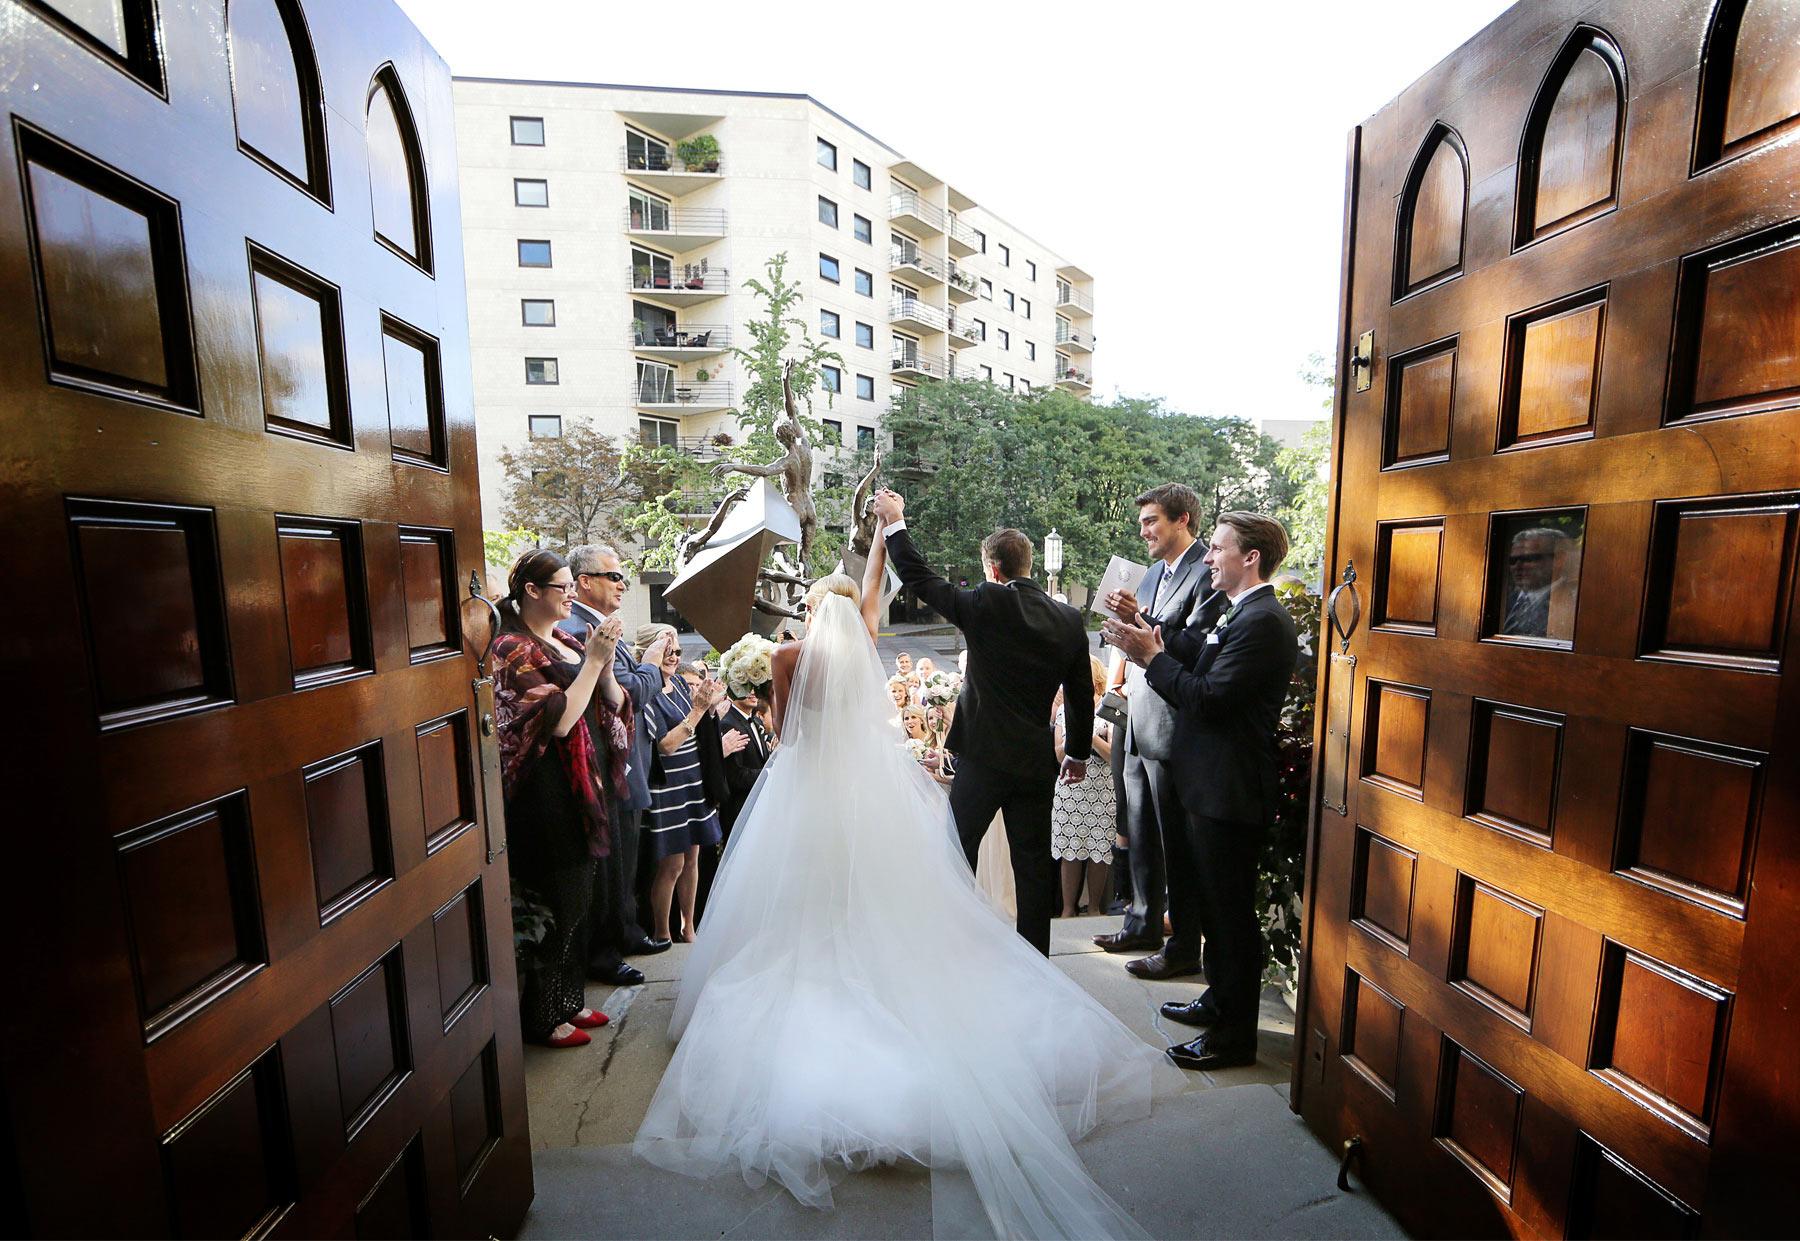 14-Minneapolis-Minnesota-Wedding-Photography-by-Vick-Photography-Westminister-Presbyterian-Ceremony-Sarah-&-Brett.jpg